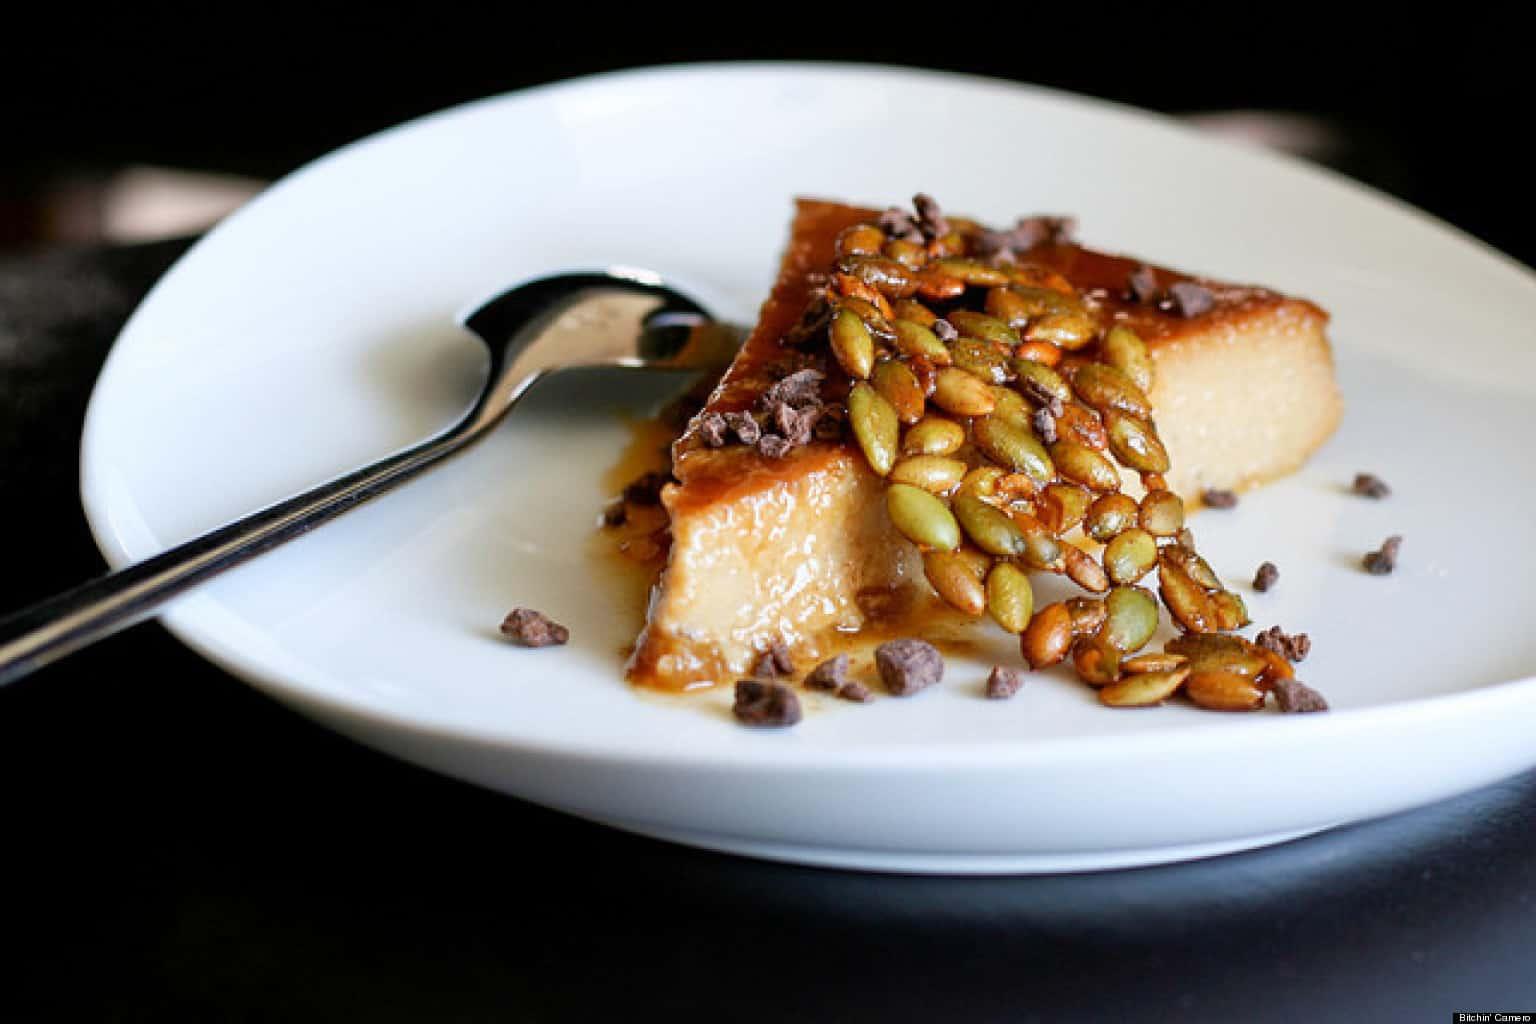 Brown sugar pumpkin seed brittle with cheesecake